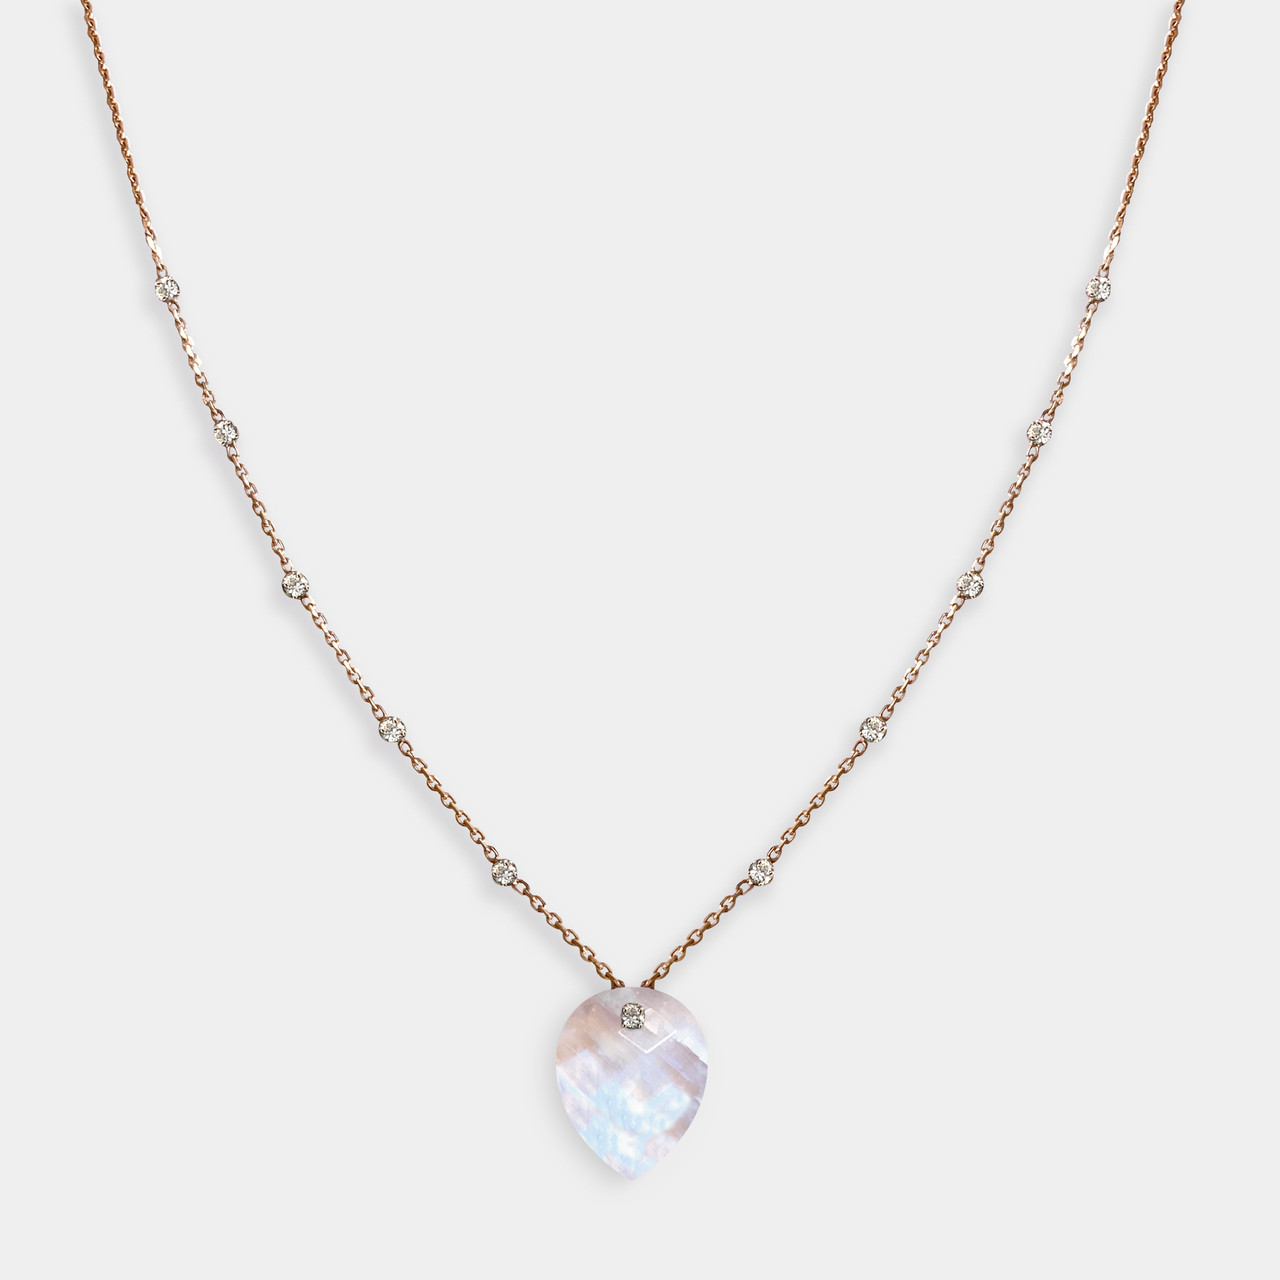 Collier 11 Diamants Pierre de Lune Rainbow, Collier Or Femme Pierre de Lune Rainbow